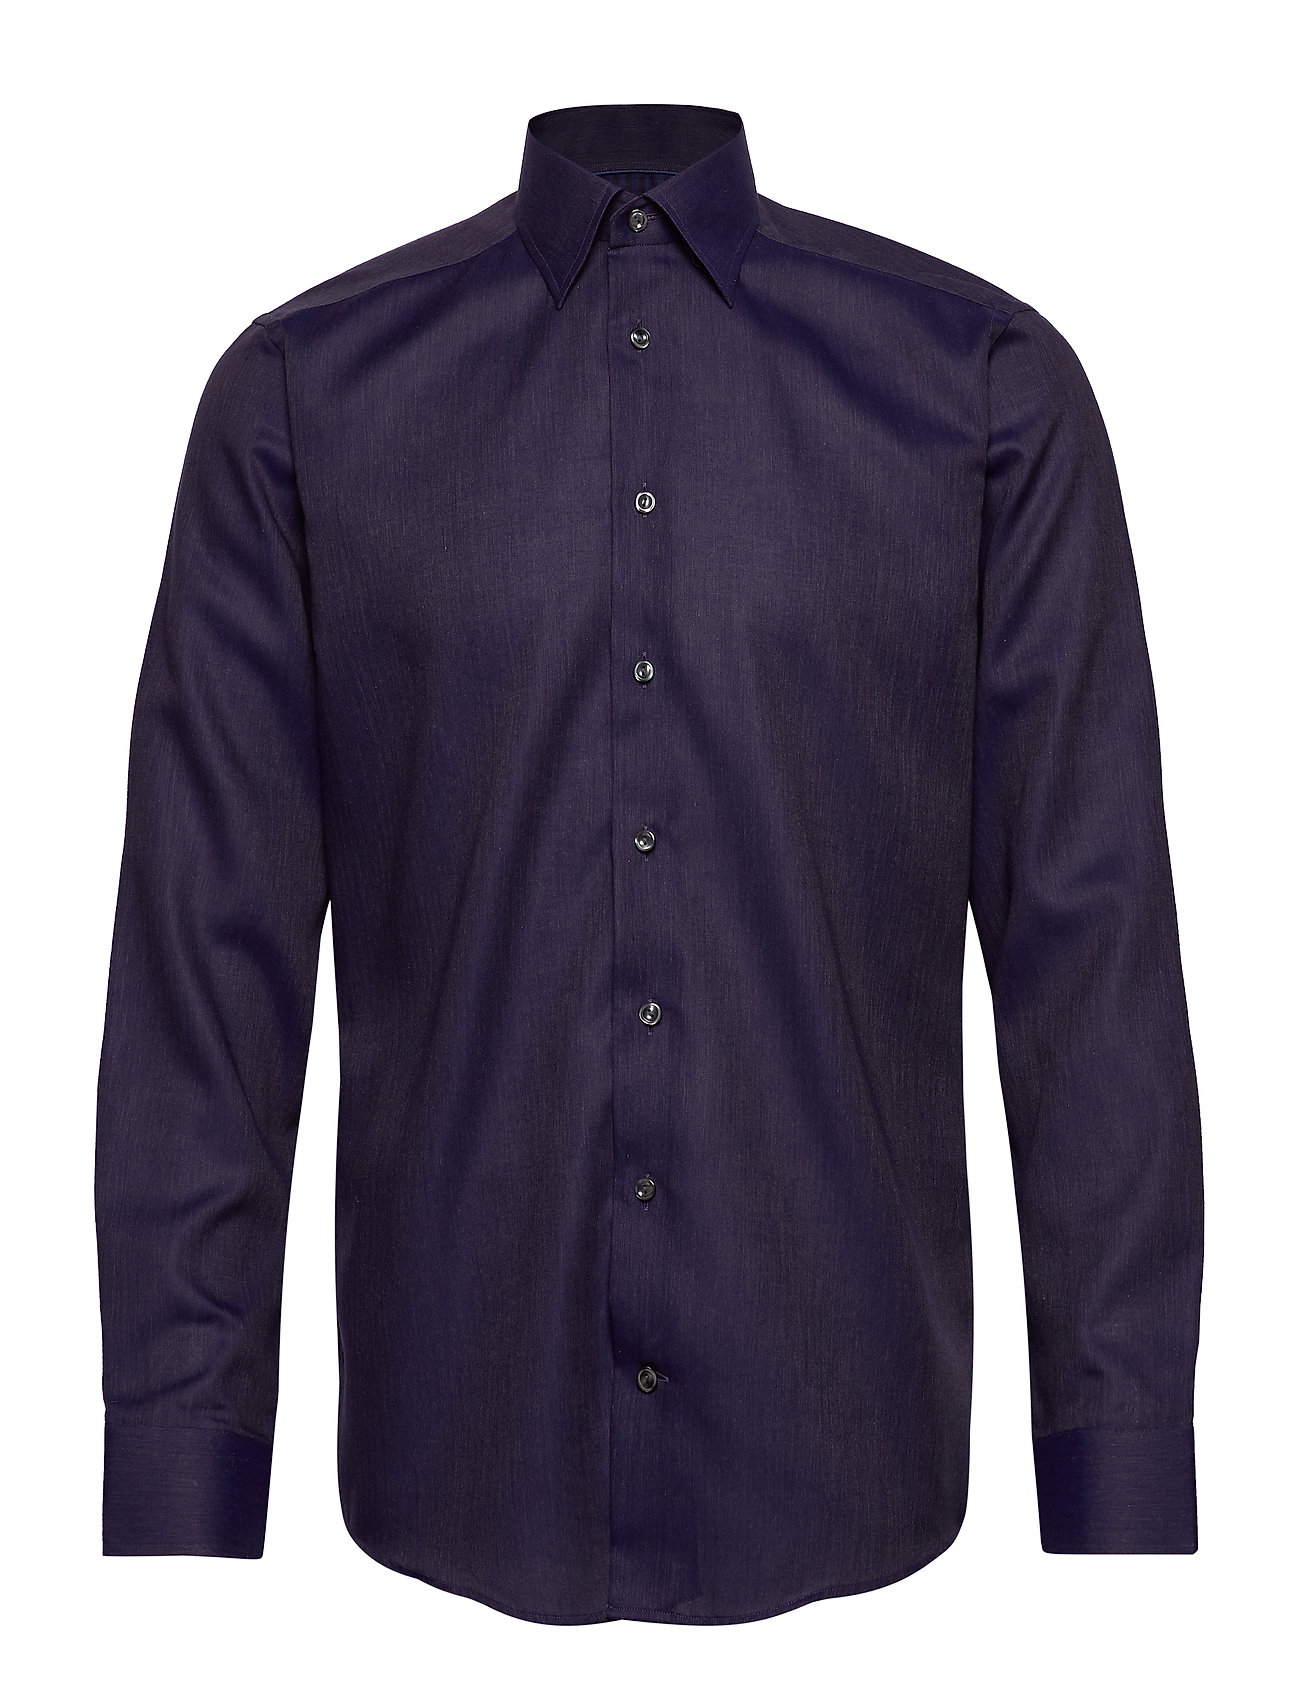 Eton Blue Herringbone Flannel Shirt - BLUE